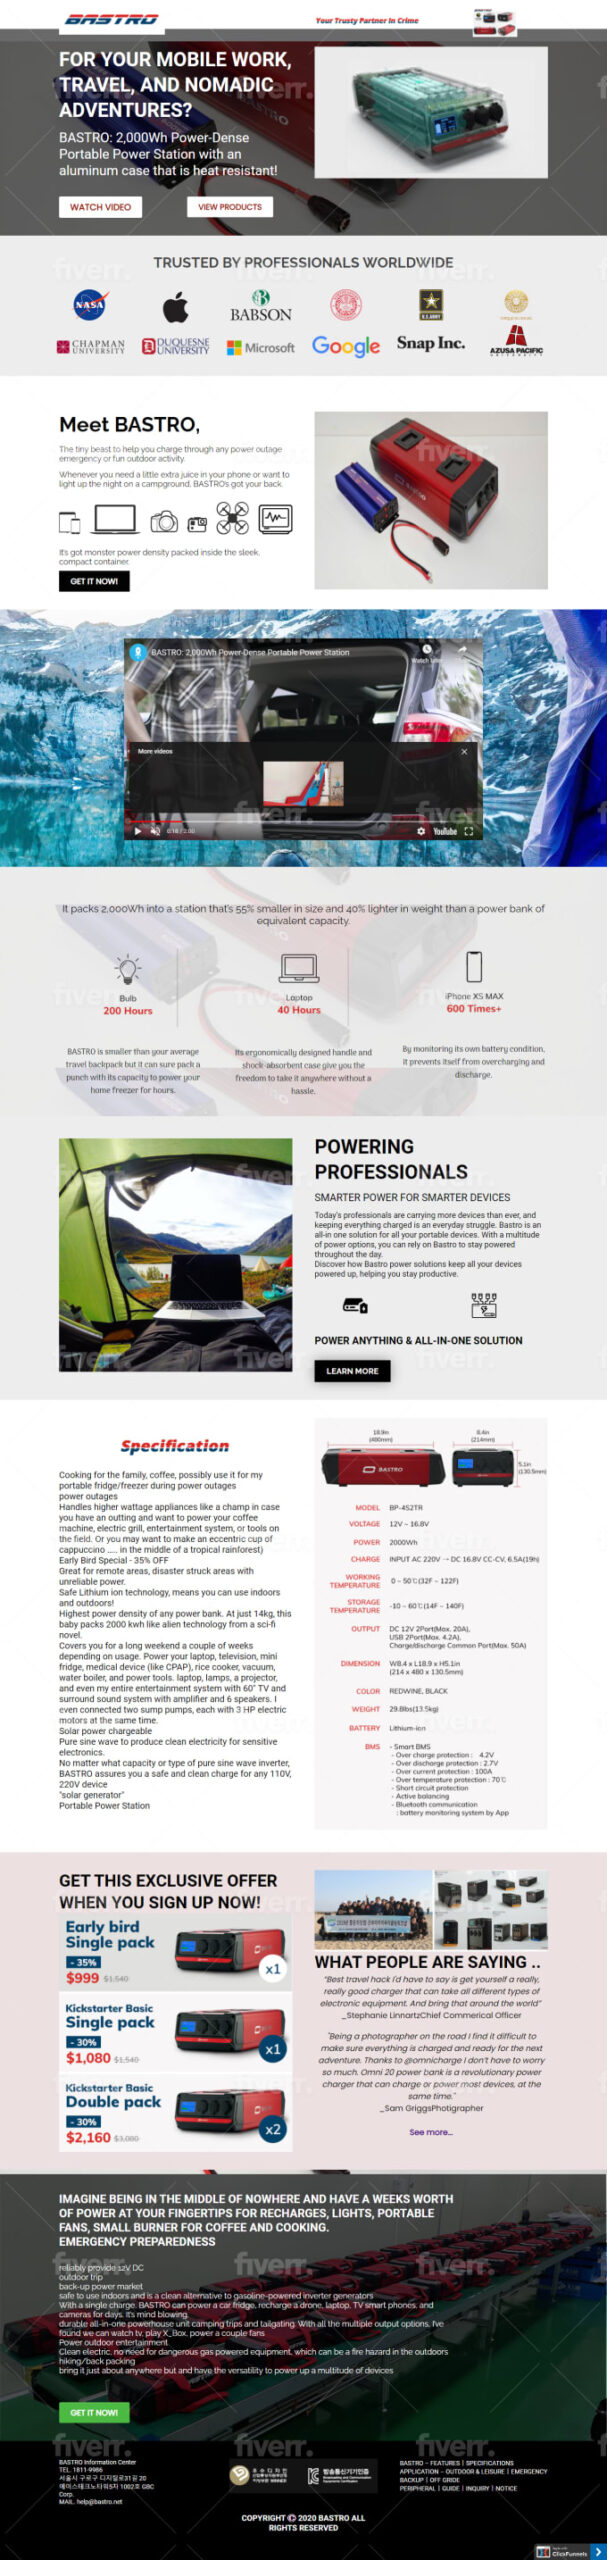 I will create custom roi sales funnel guaranteed clickfunnels sales funnel, FiverrBox